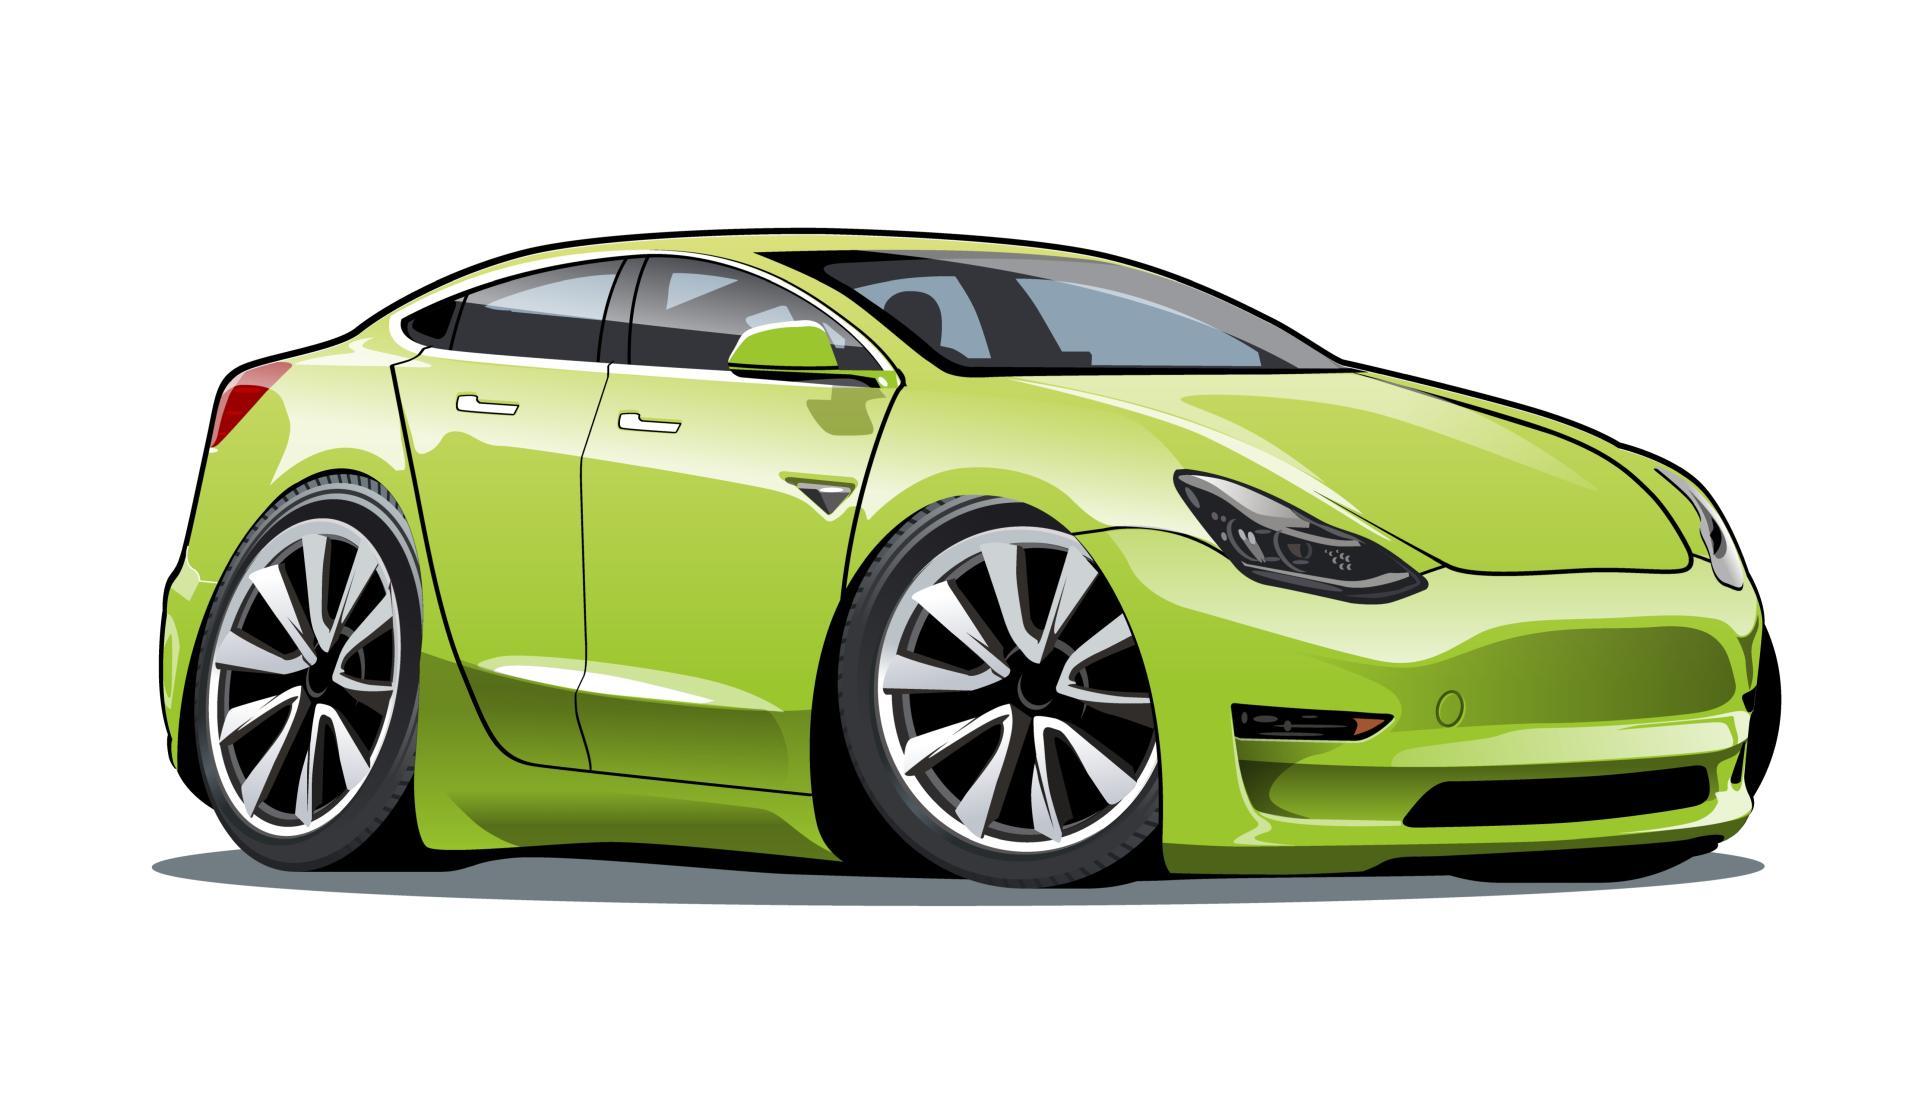 Tesla kündigt 25.000 USD E-Auto an - kommt es auf Basis VW MEB-Entry-Plattform?